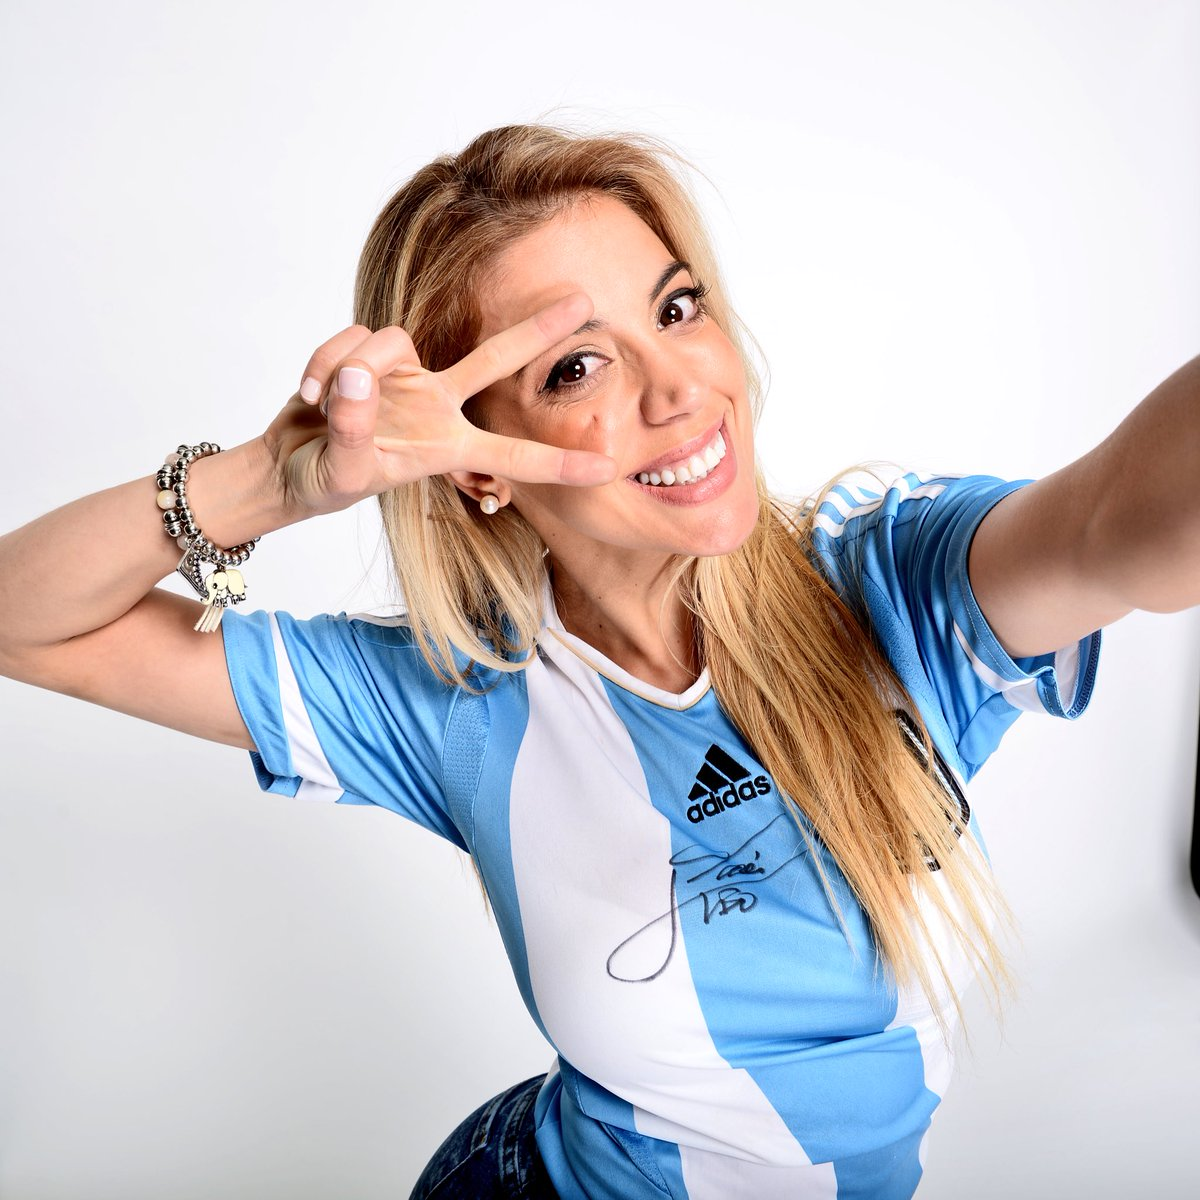 virginia gallardo (@virchugallardo) | Twitter